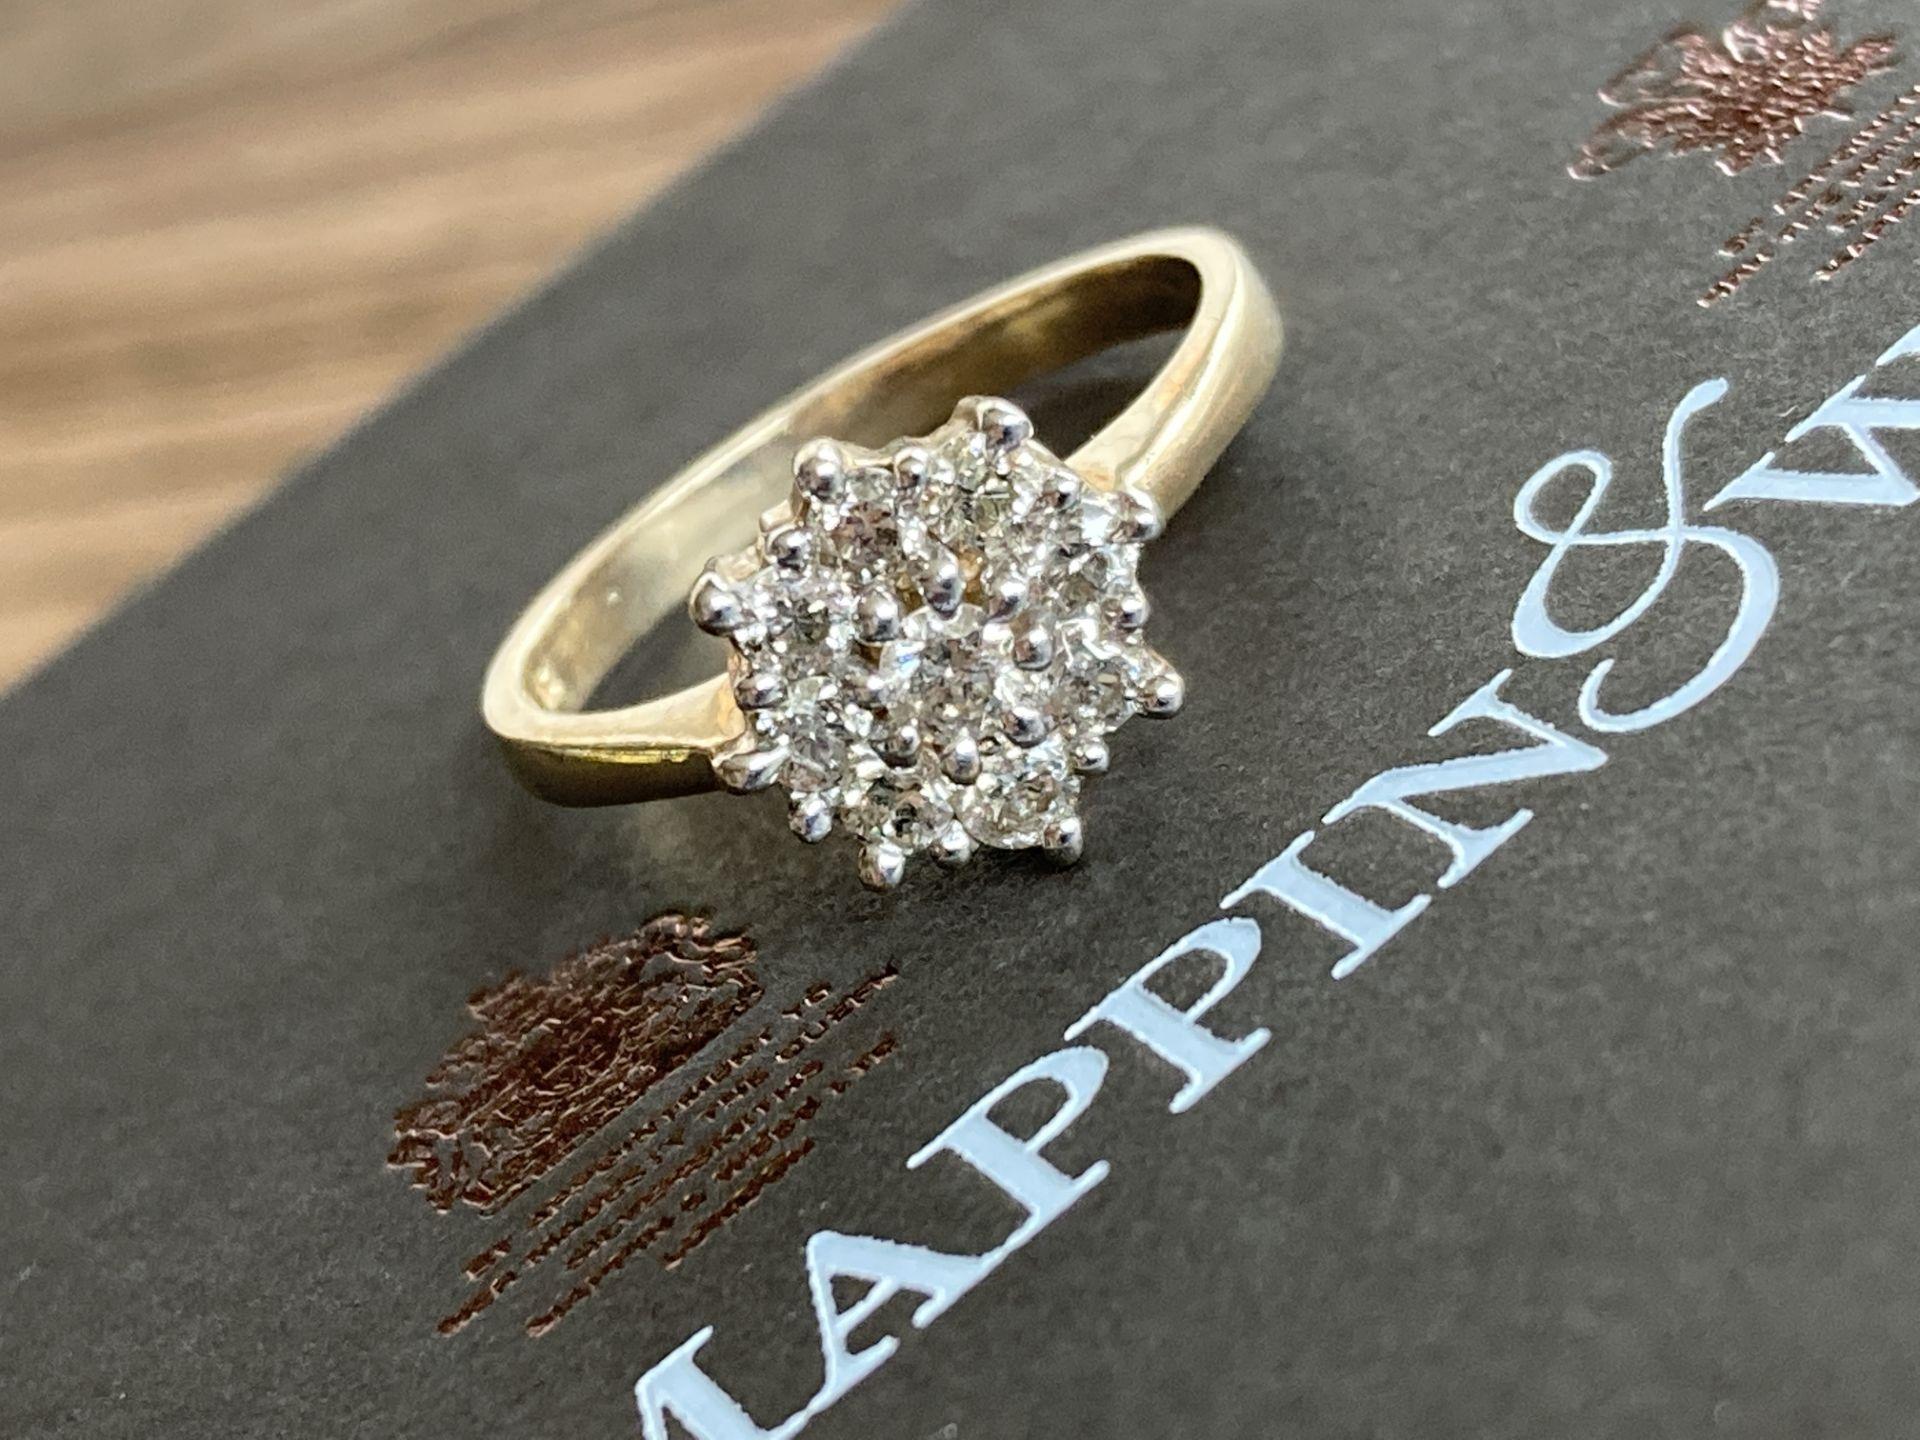 9CT GOLD 0.5CT DIAMOND RING